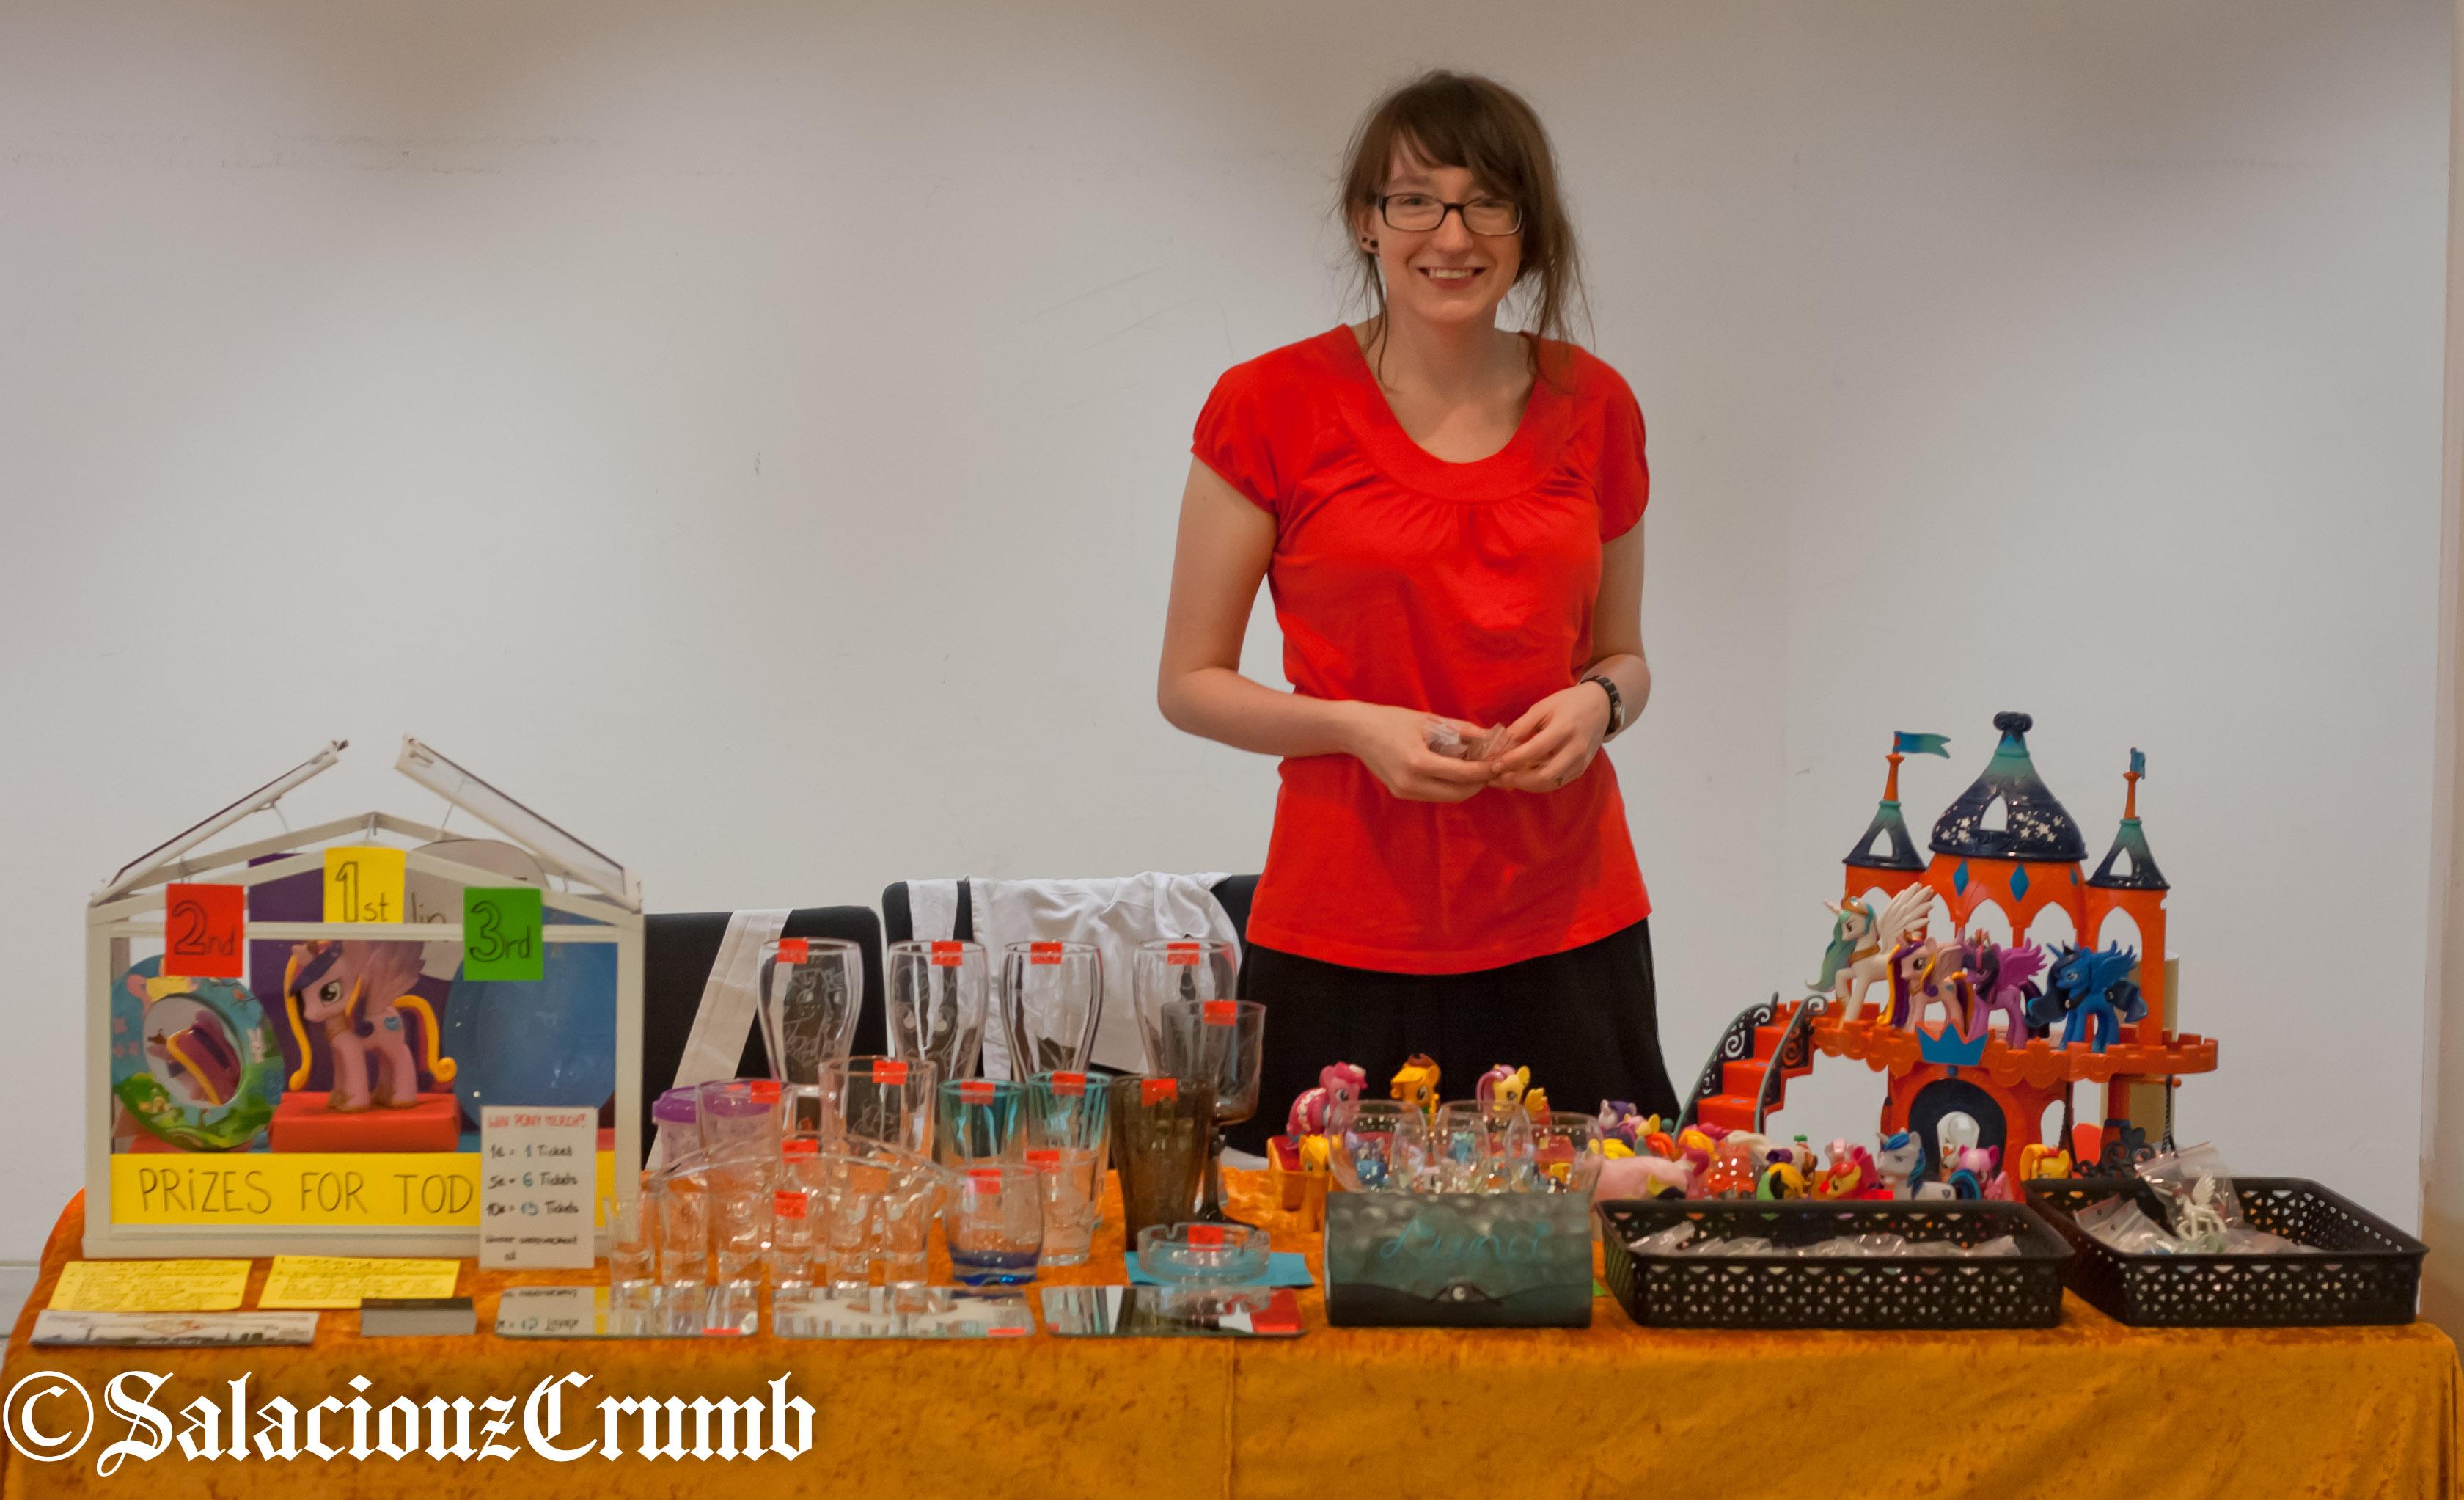 Gala-Con2014 - Vendor ateloK by SalaciouzCrumb